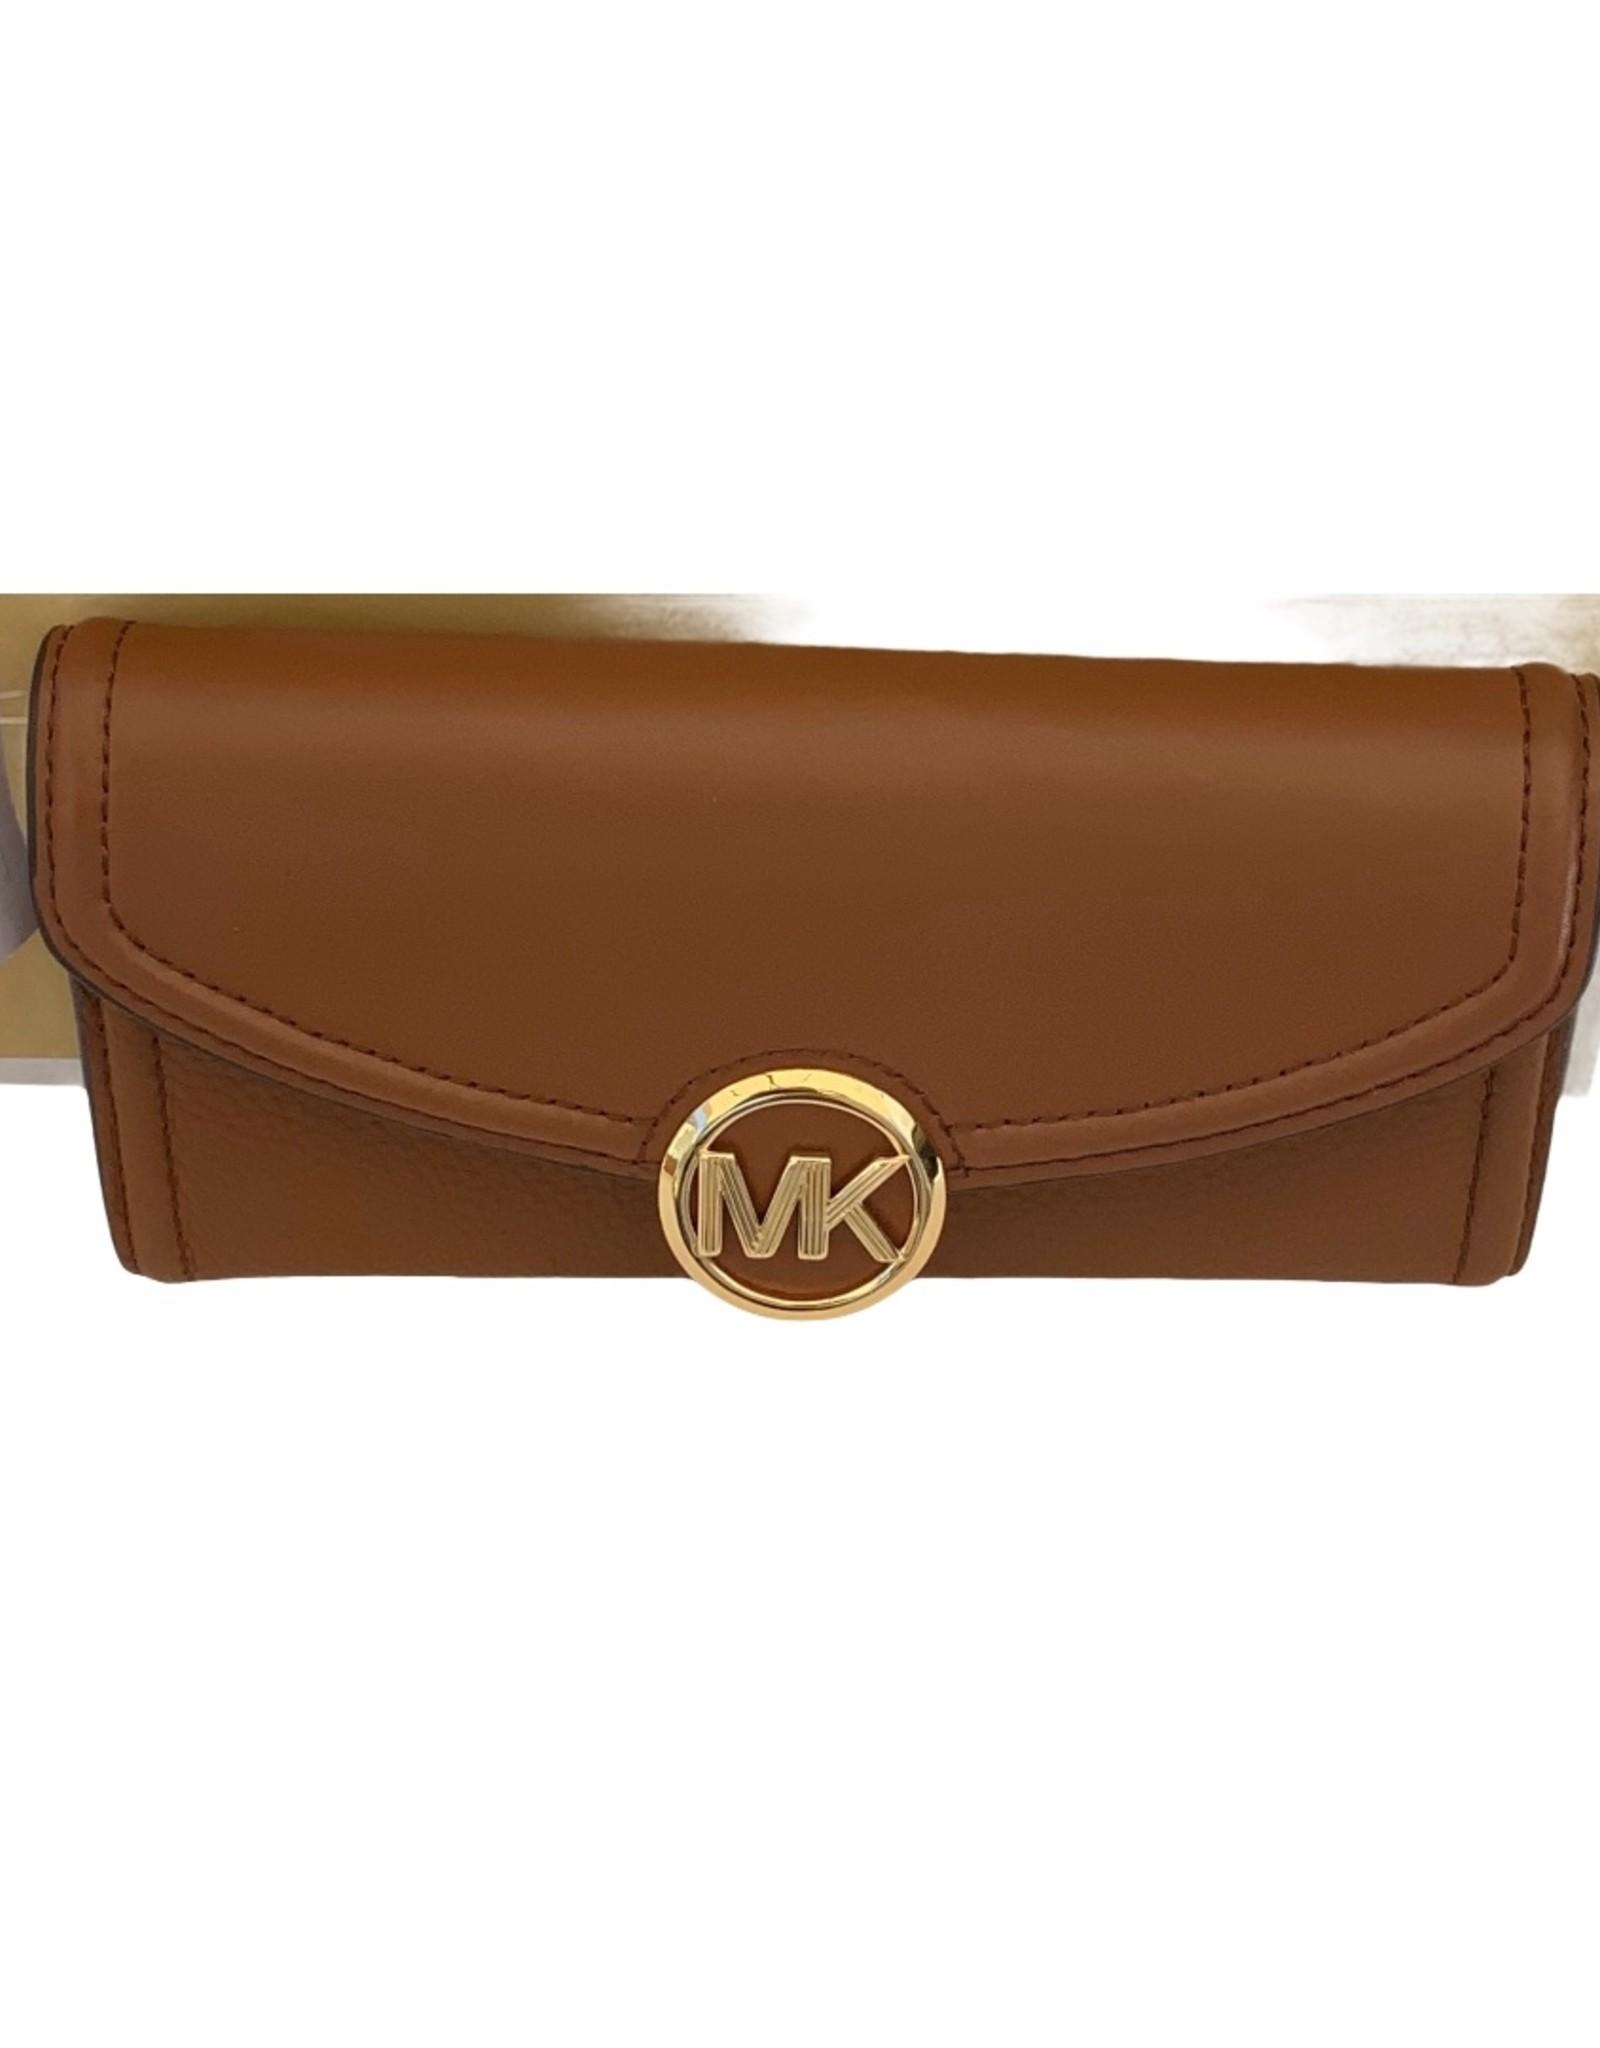 Michael Kors Michael Kors Wallet Flap Continental Large